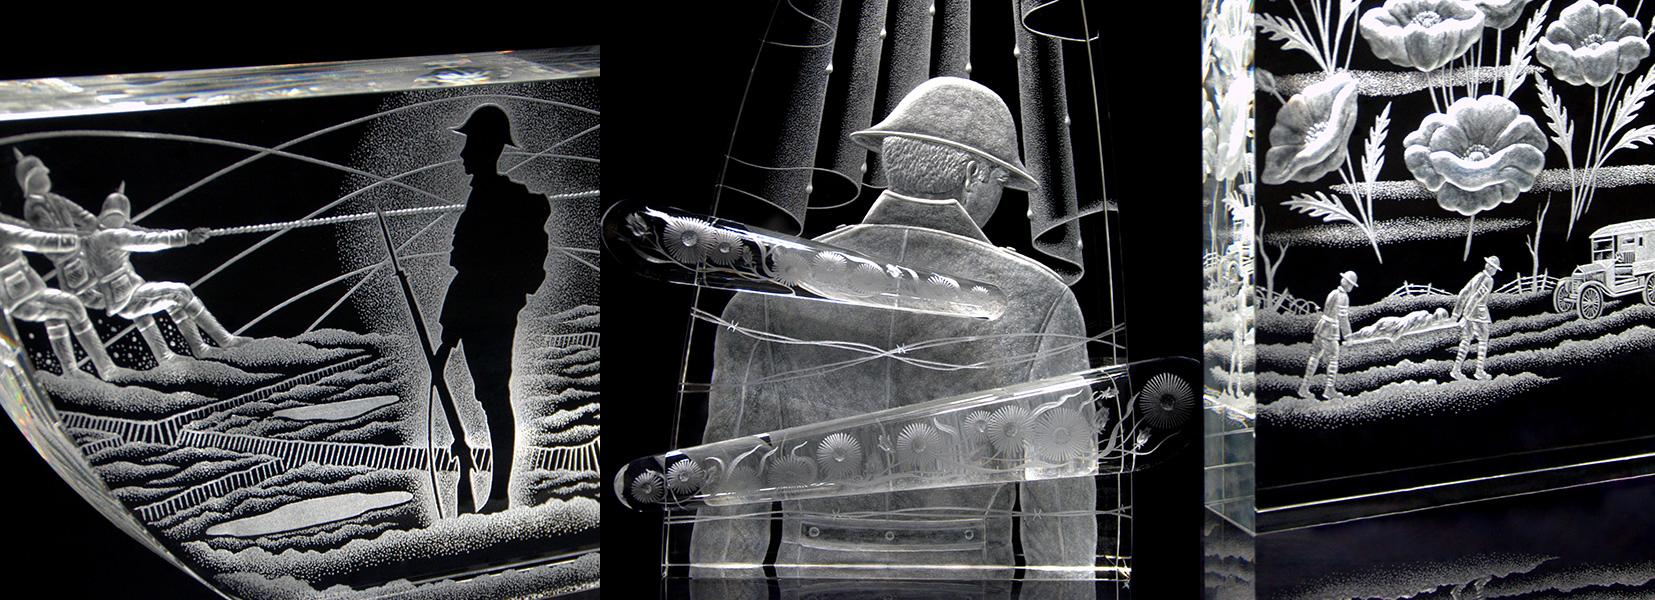 Crystal work by Mark Raynes Roberts